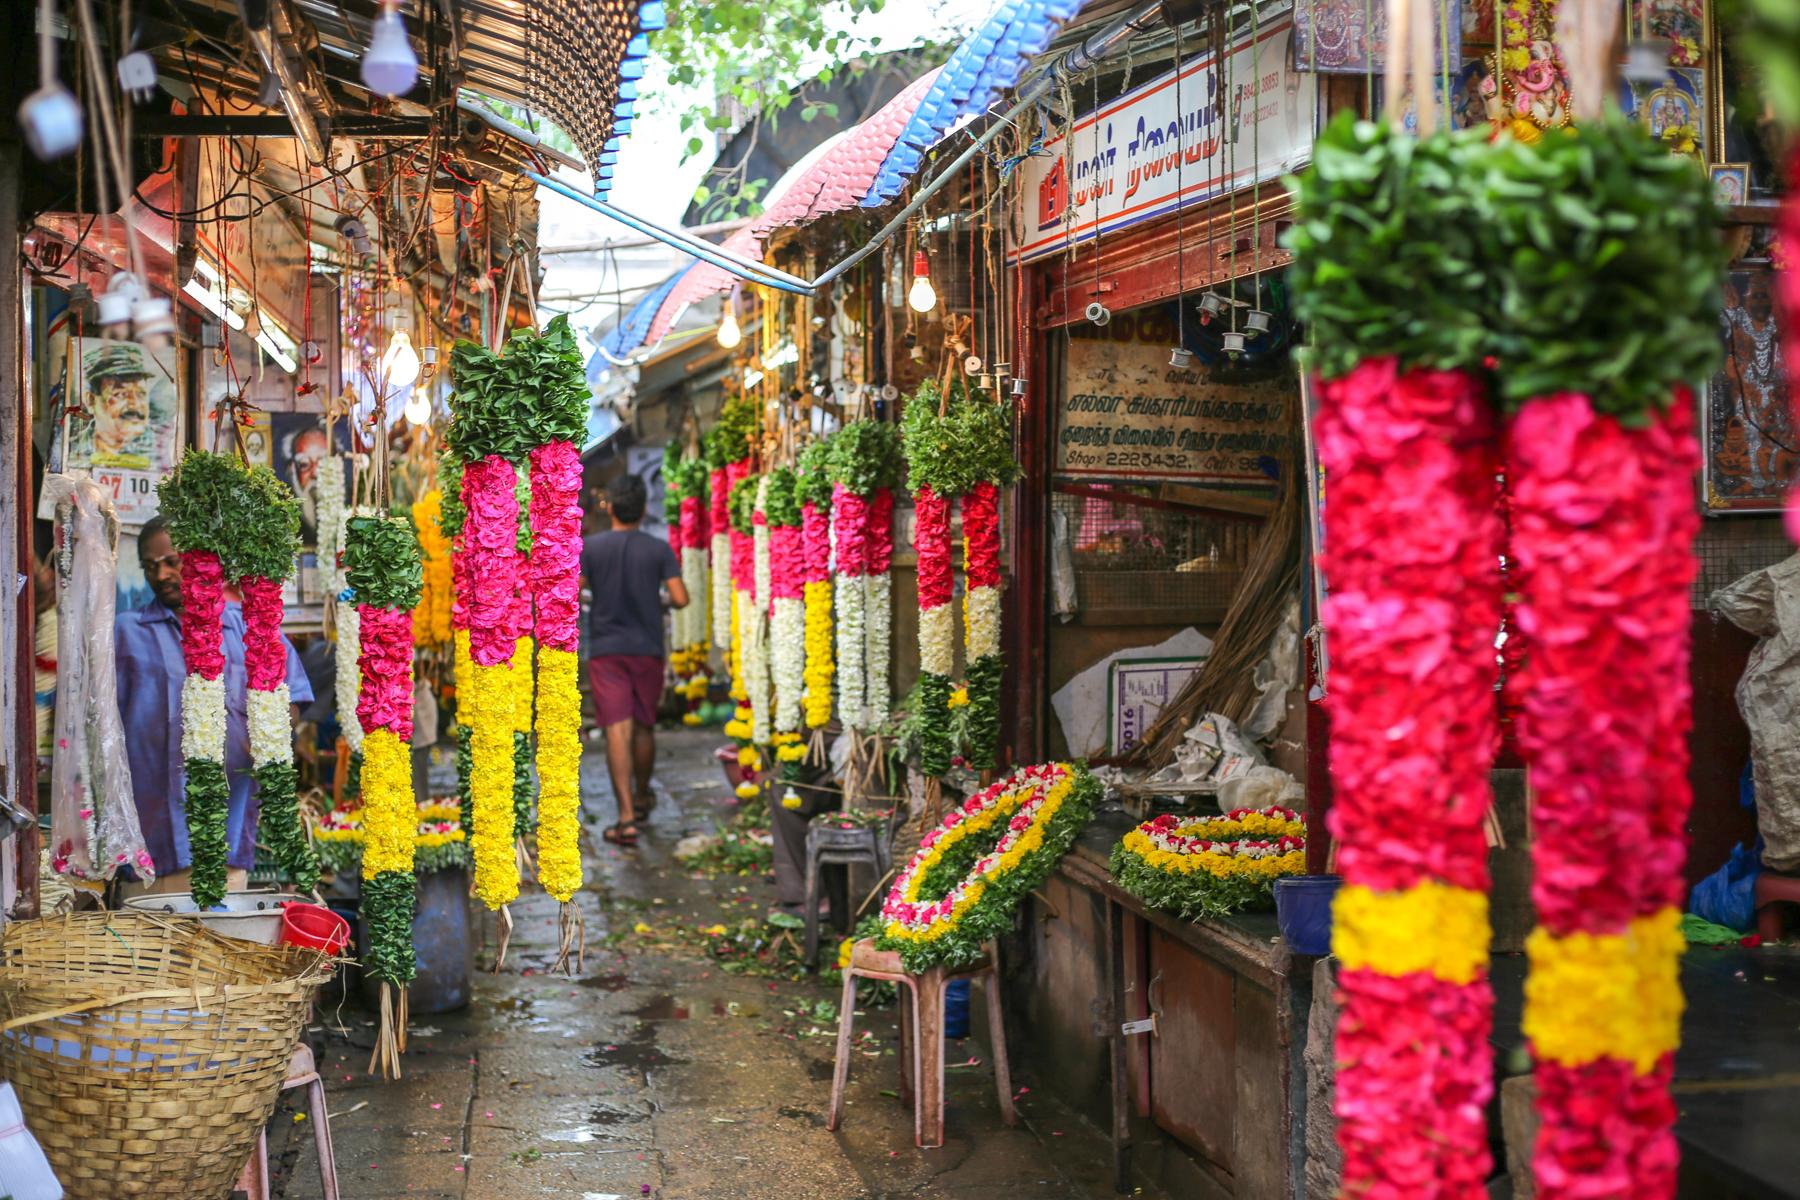 inde-marché-pondichery-goubert-market-fleurs